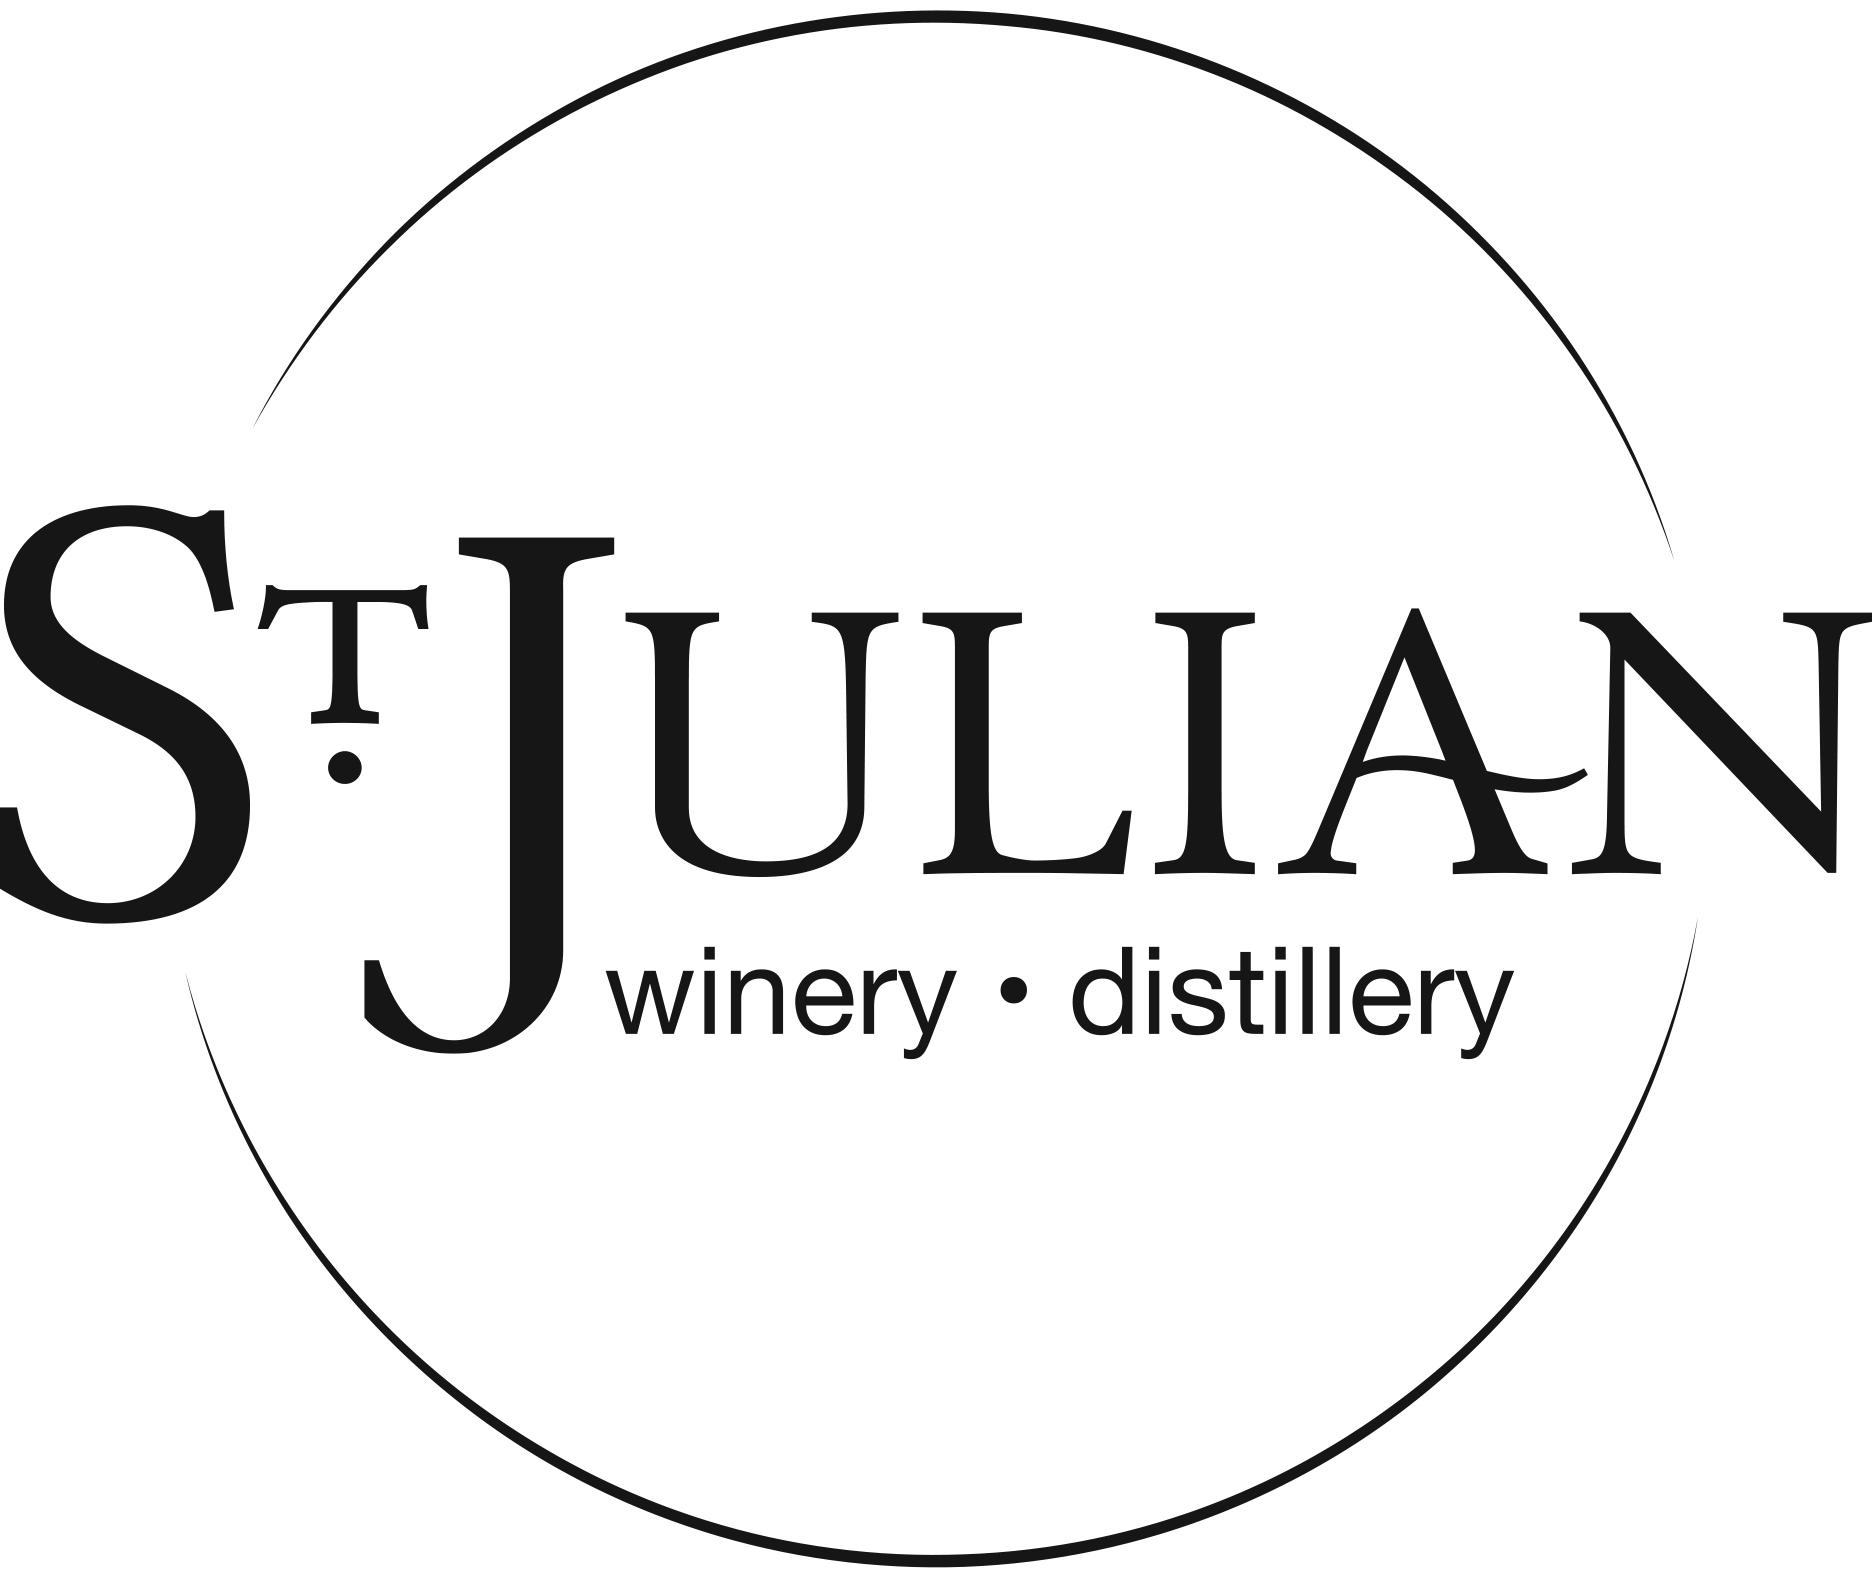 St. Jullian Winery Distillery